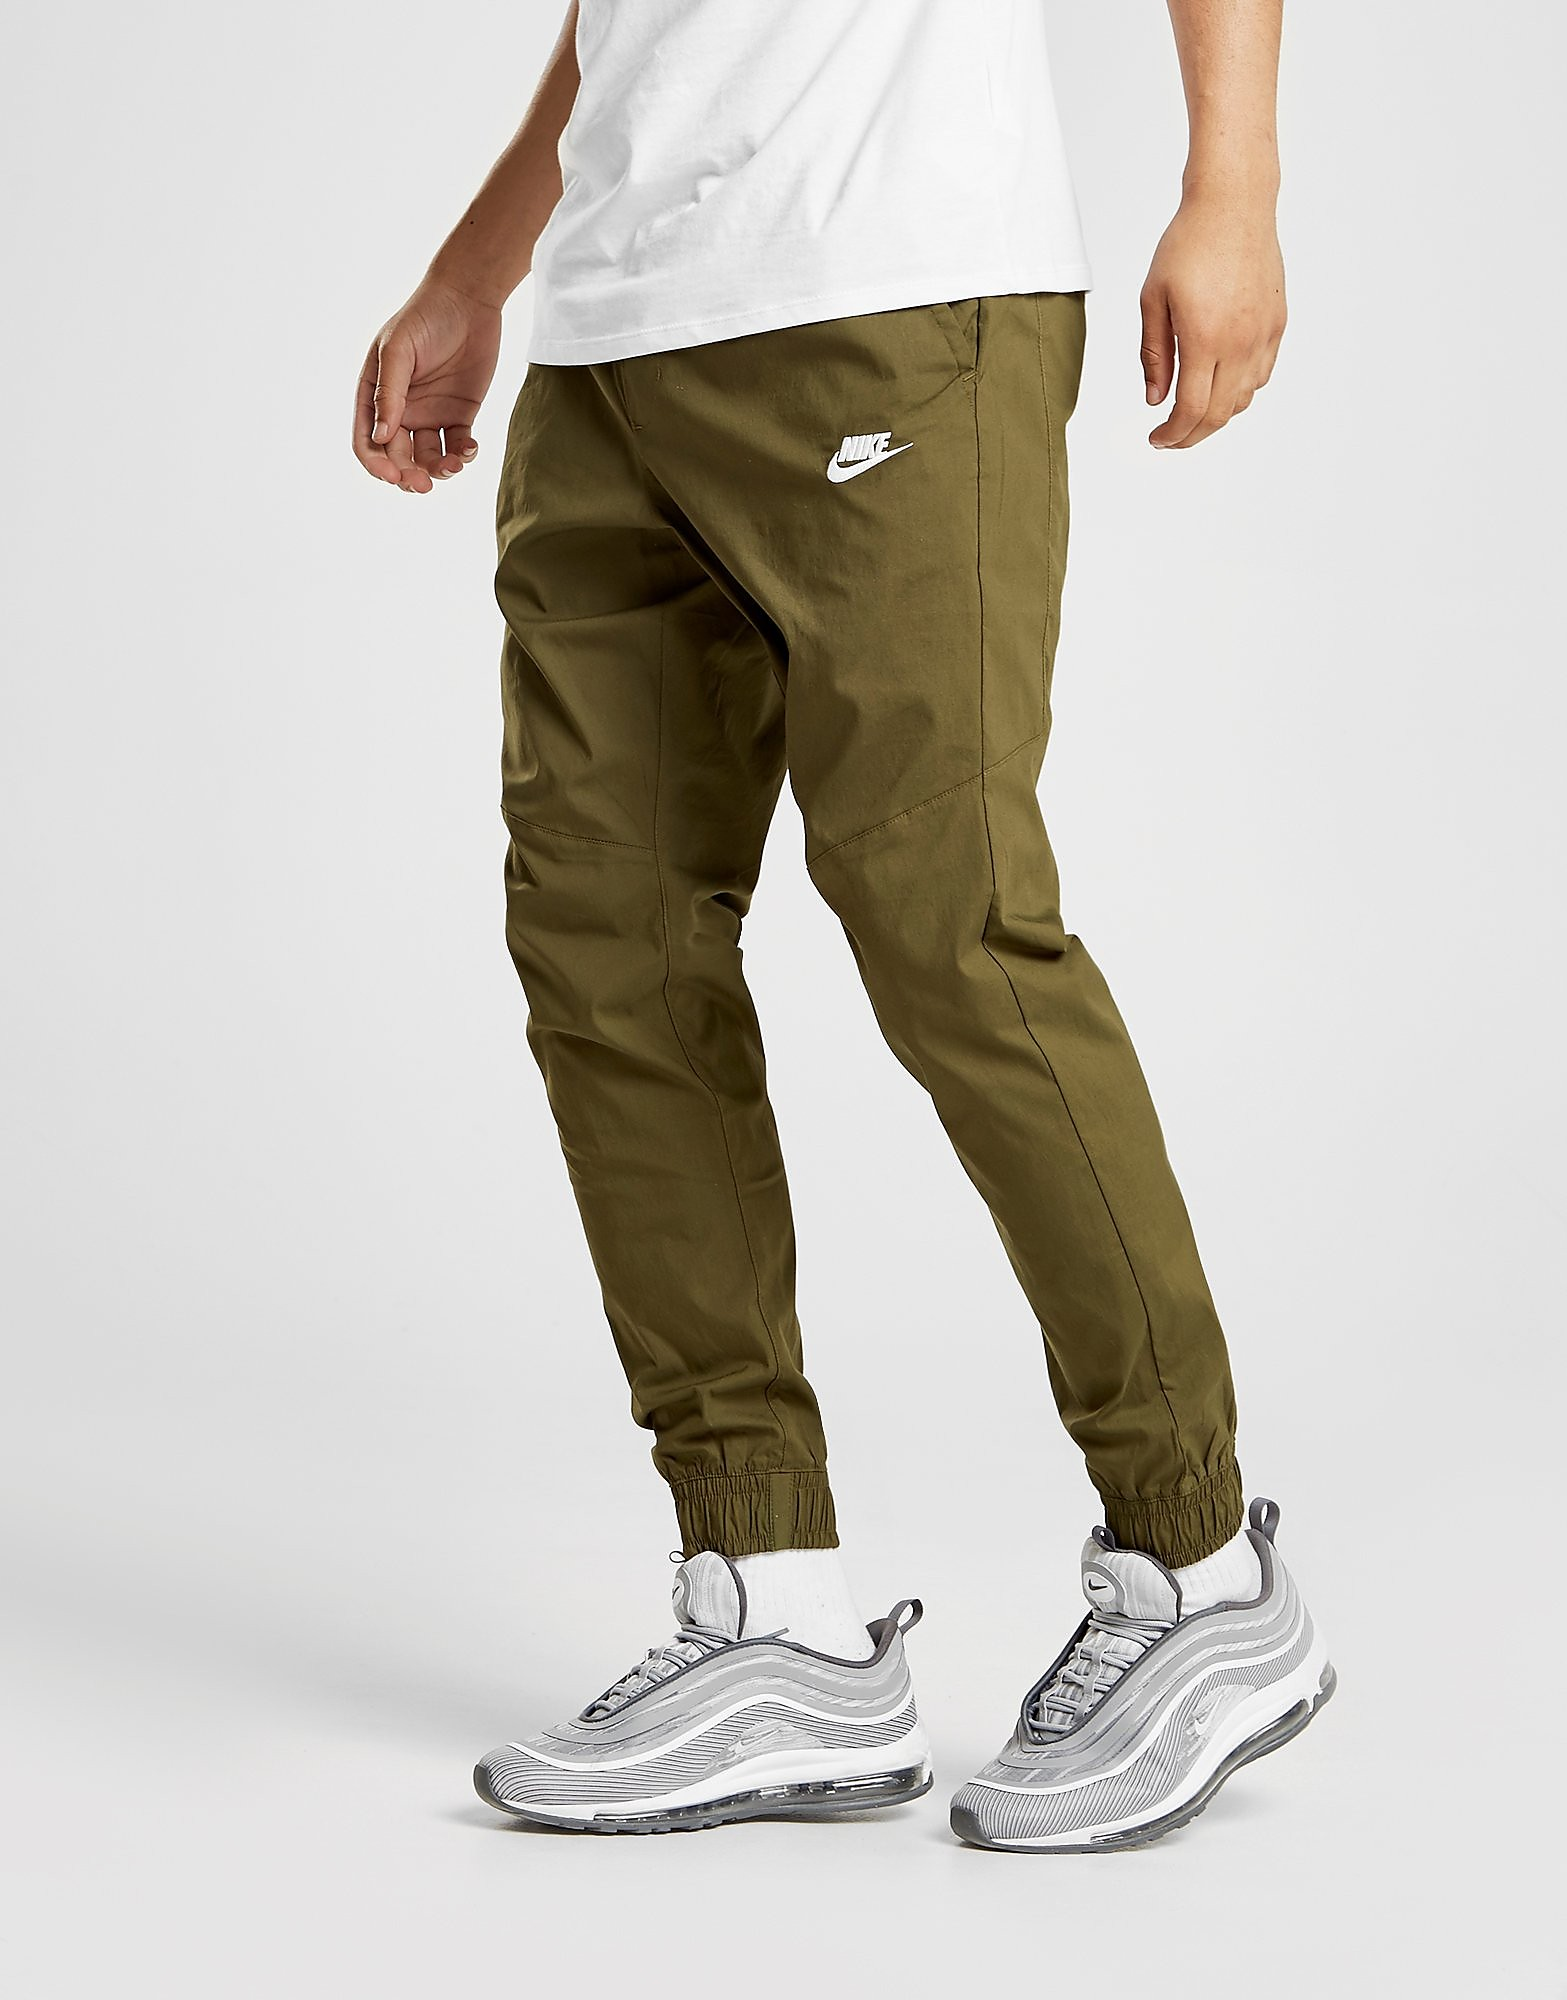 Nike Twill Track Pants Heren - Olive/Olive - Heren